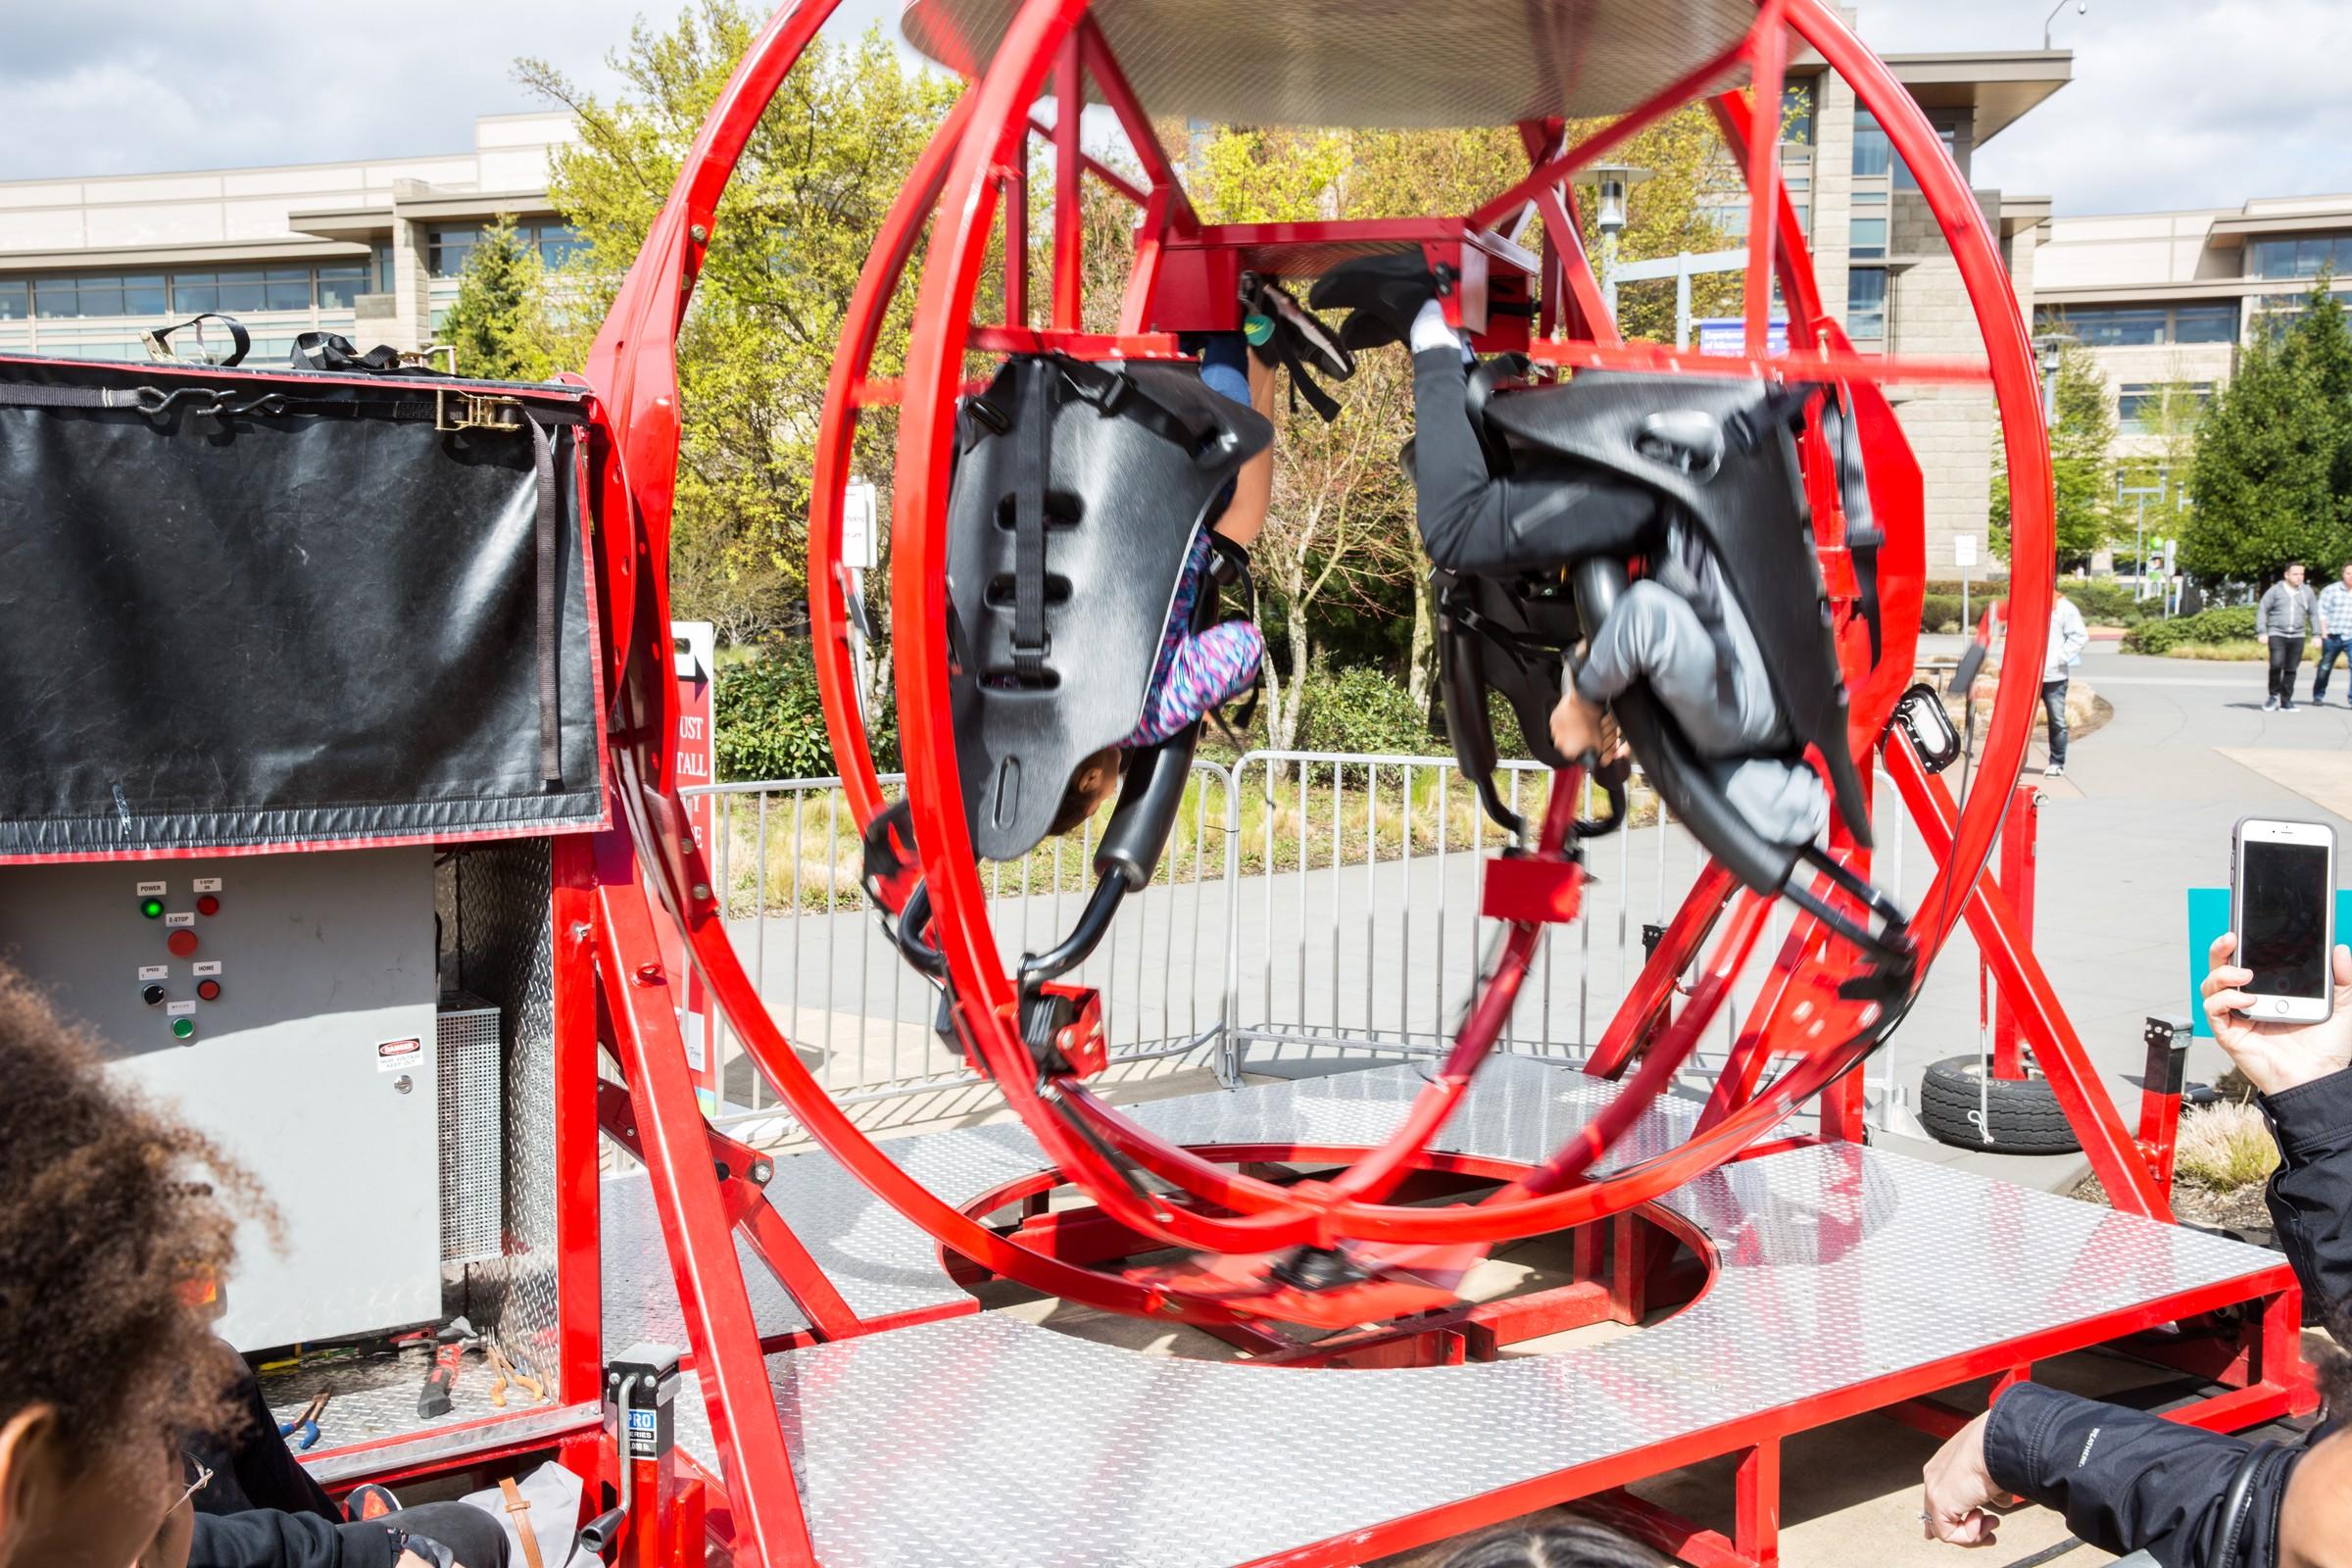 Gravitron Human Gyroscope 4 Seat Aerotrim Rental